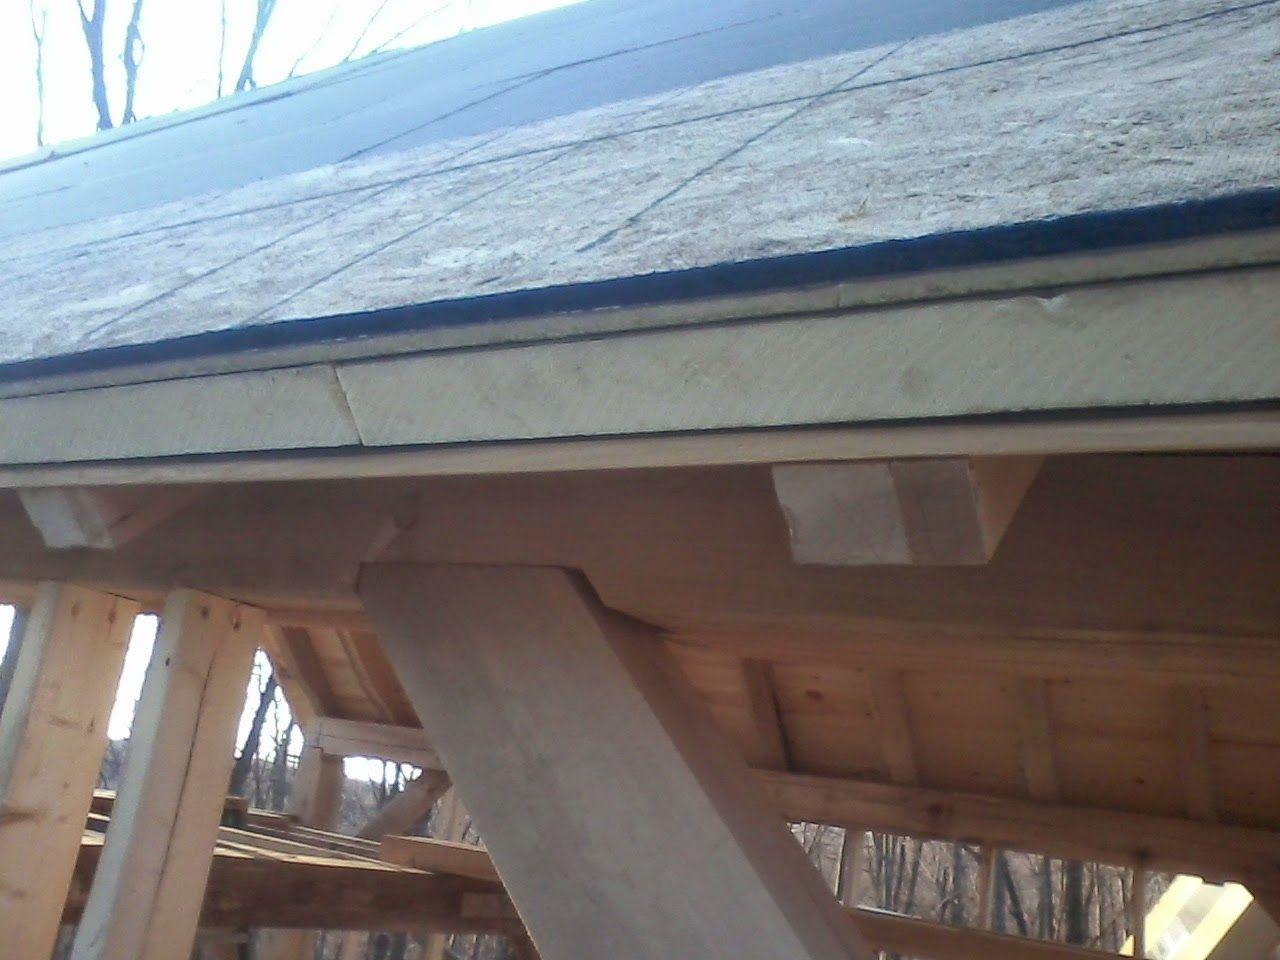 Proper Way To Install Foam Board Insulation On Top Of Roof Google Search Foam Insulation Board Insulation Board Outdoor Decor